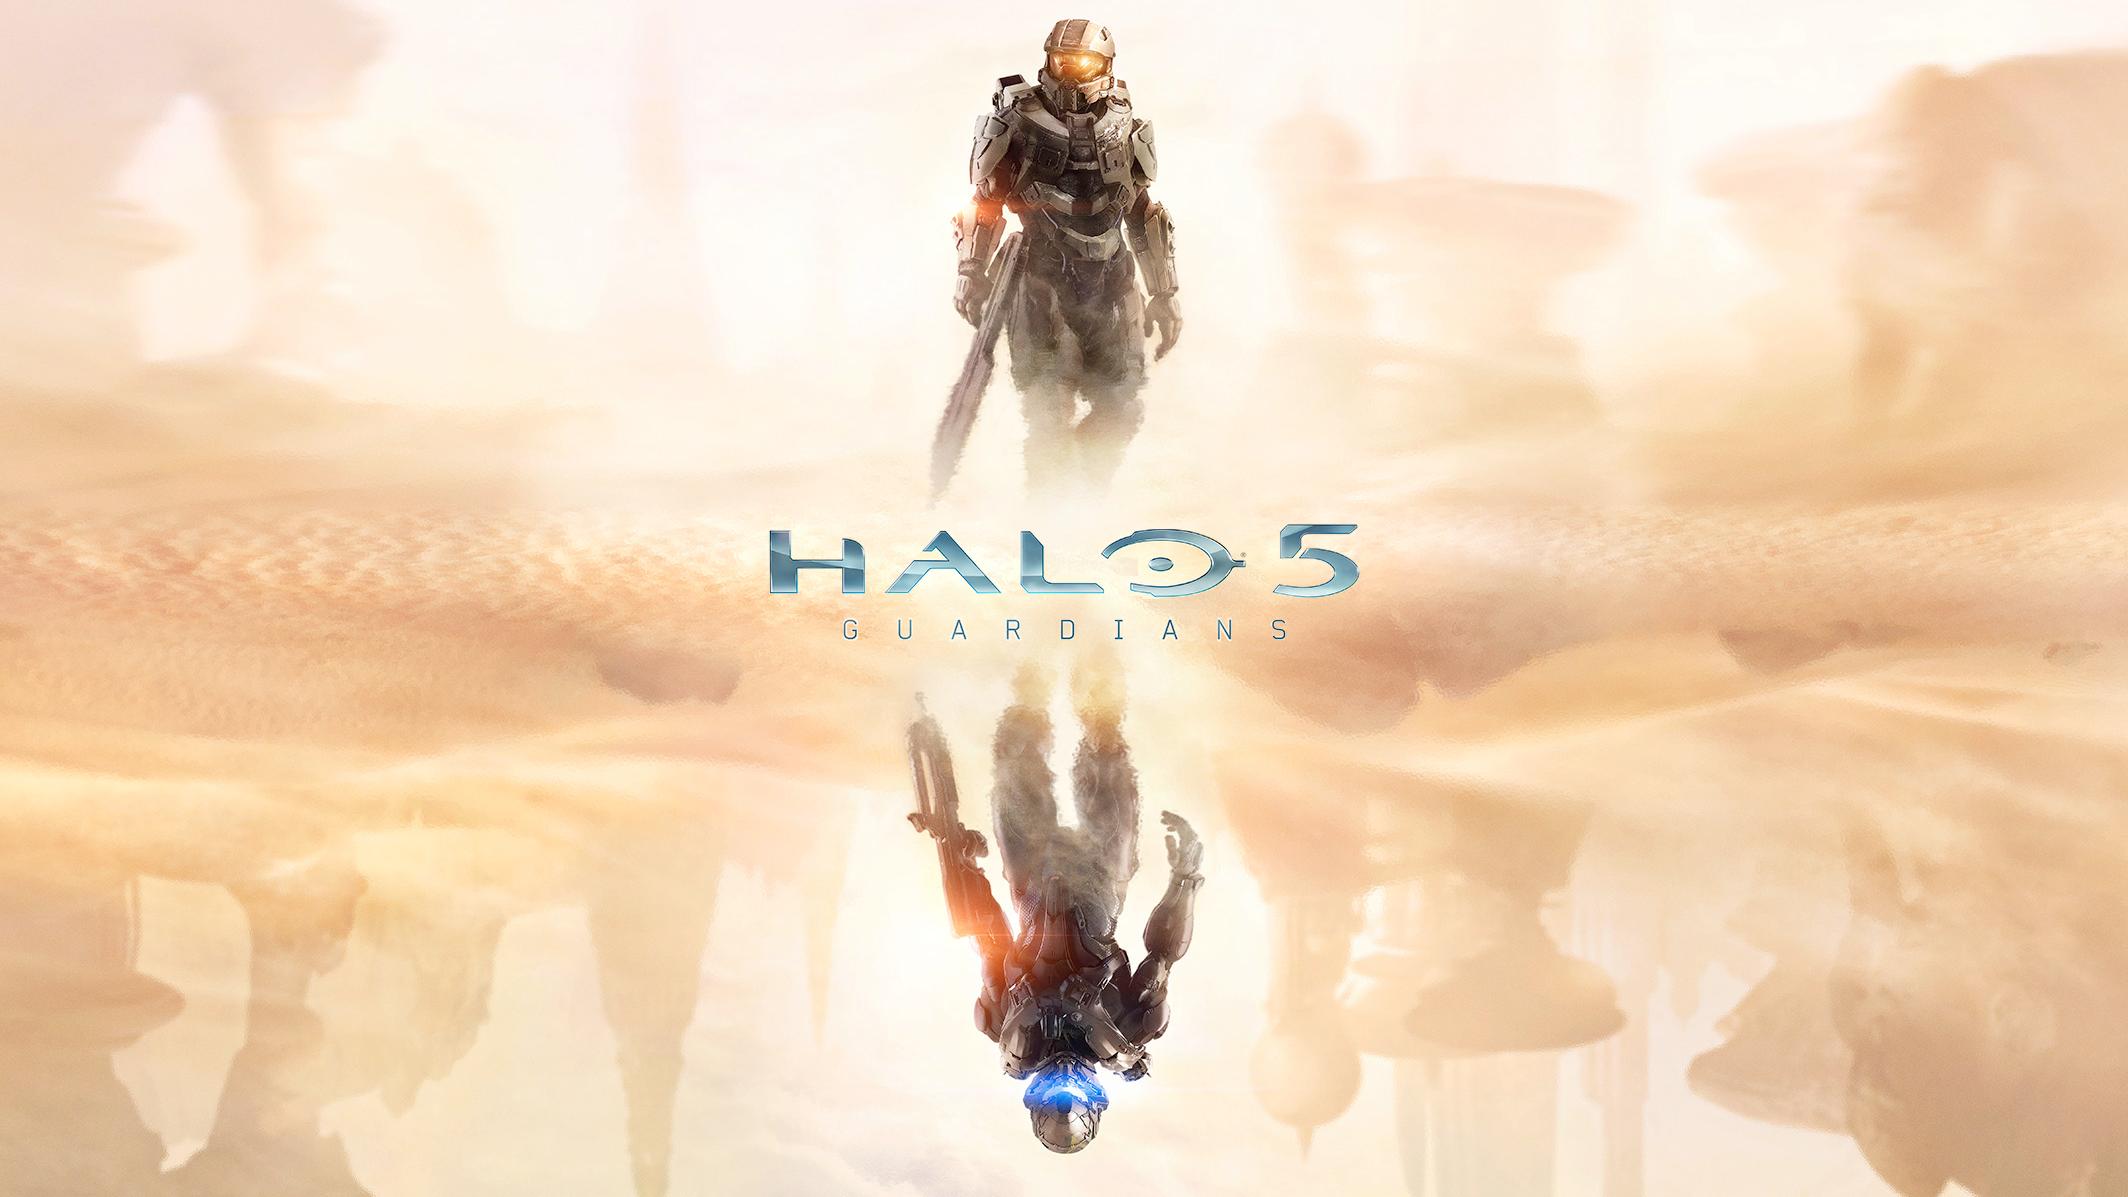 Halo 5 Guardians by RexAdde 2128x1197